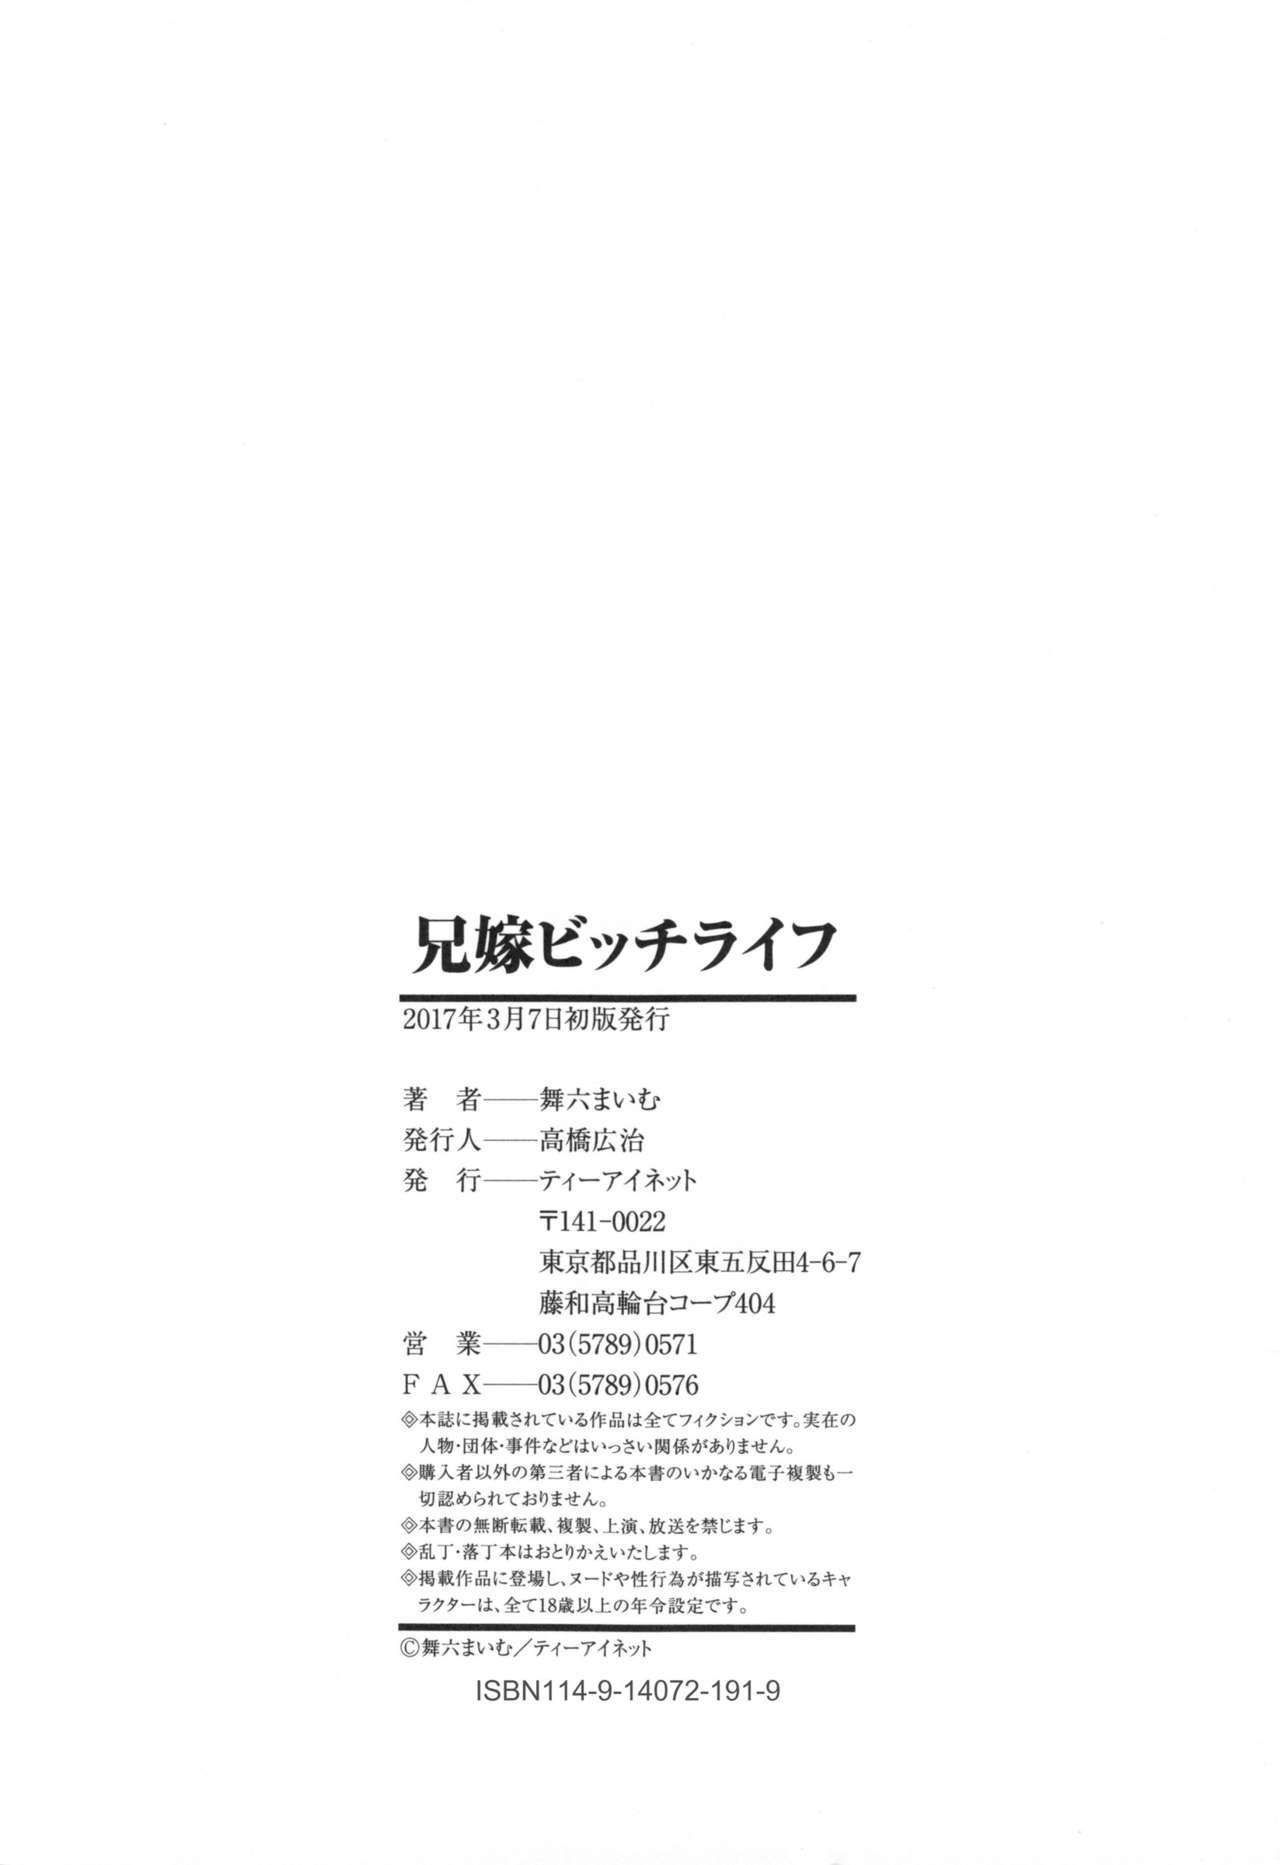 [Maimu-Maimu] Aniyome Bitch Life | Sister-in-Law Slut Life [English] {Taihen Zombii} 192